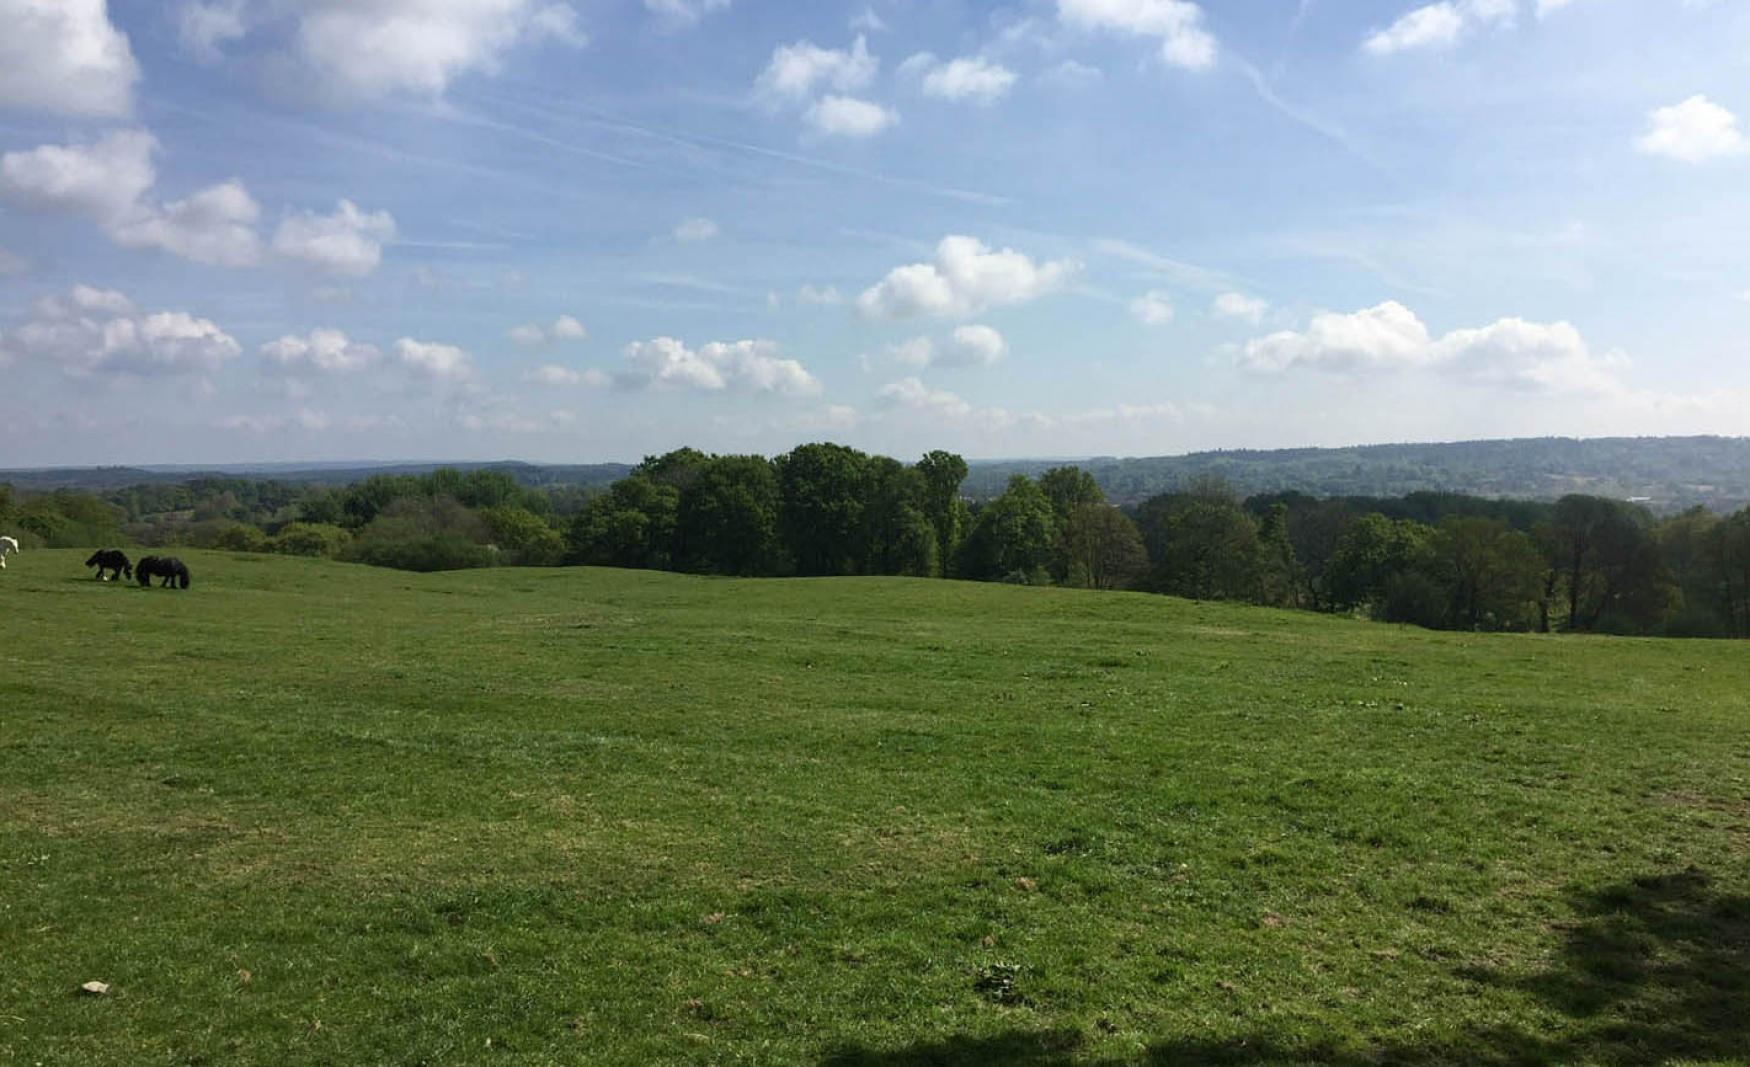 Wheatham-farm-fiesta-fields-field-to-hire copy